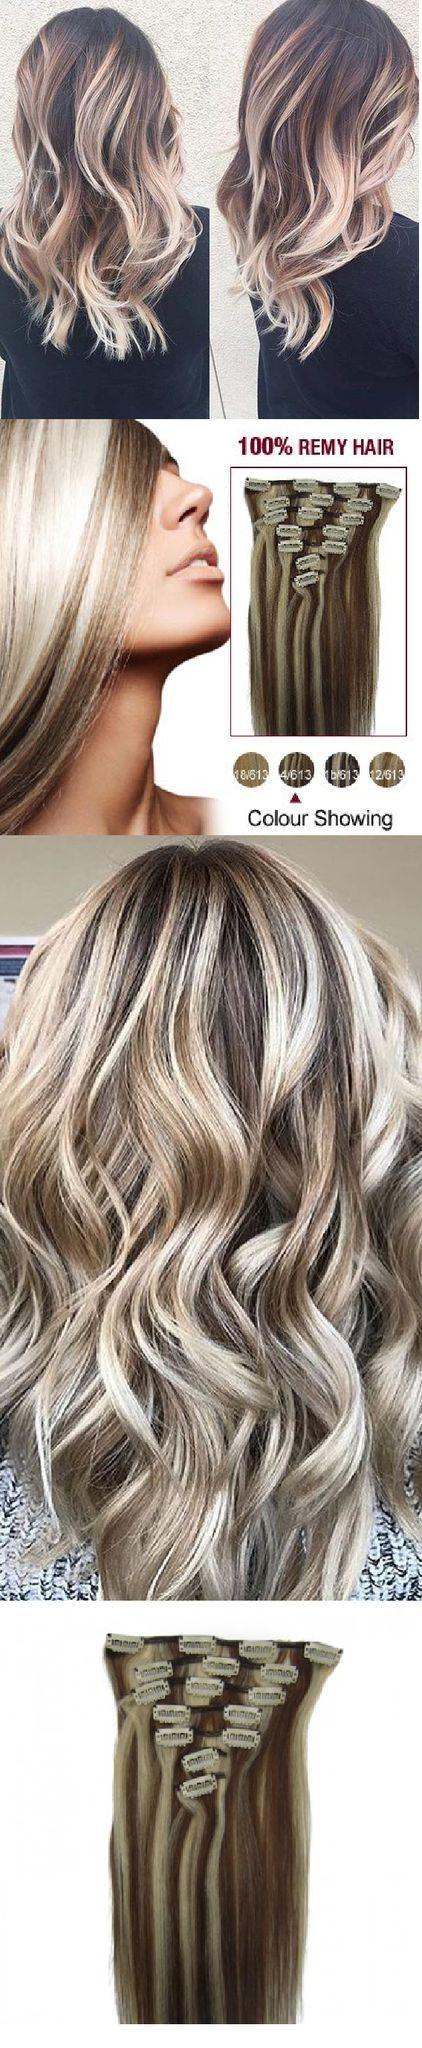 Myfashionhair Clip In Hair Extensions Real Human Hair Extensions 20